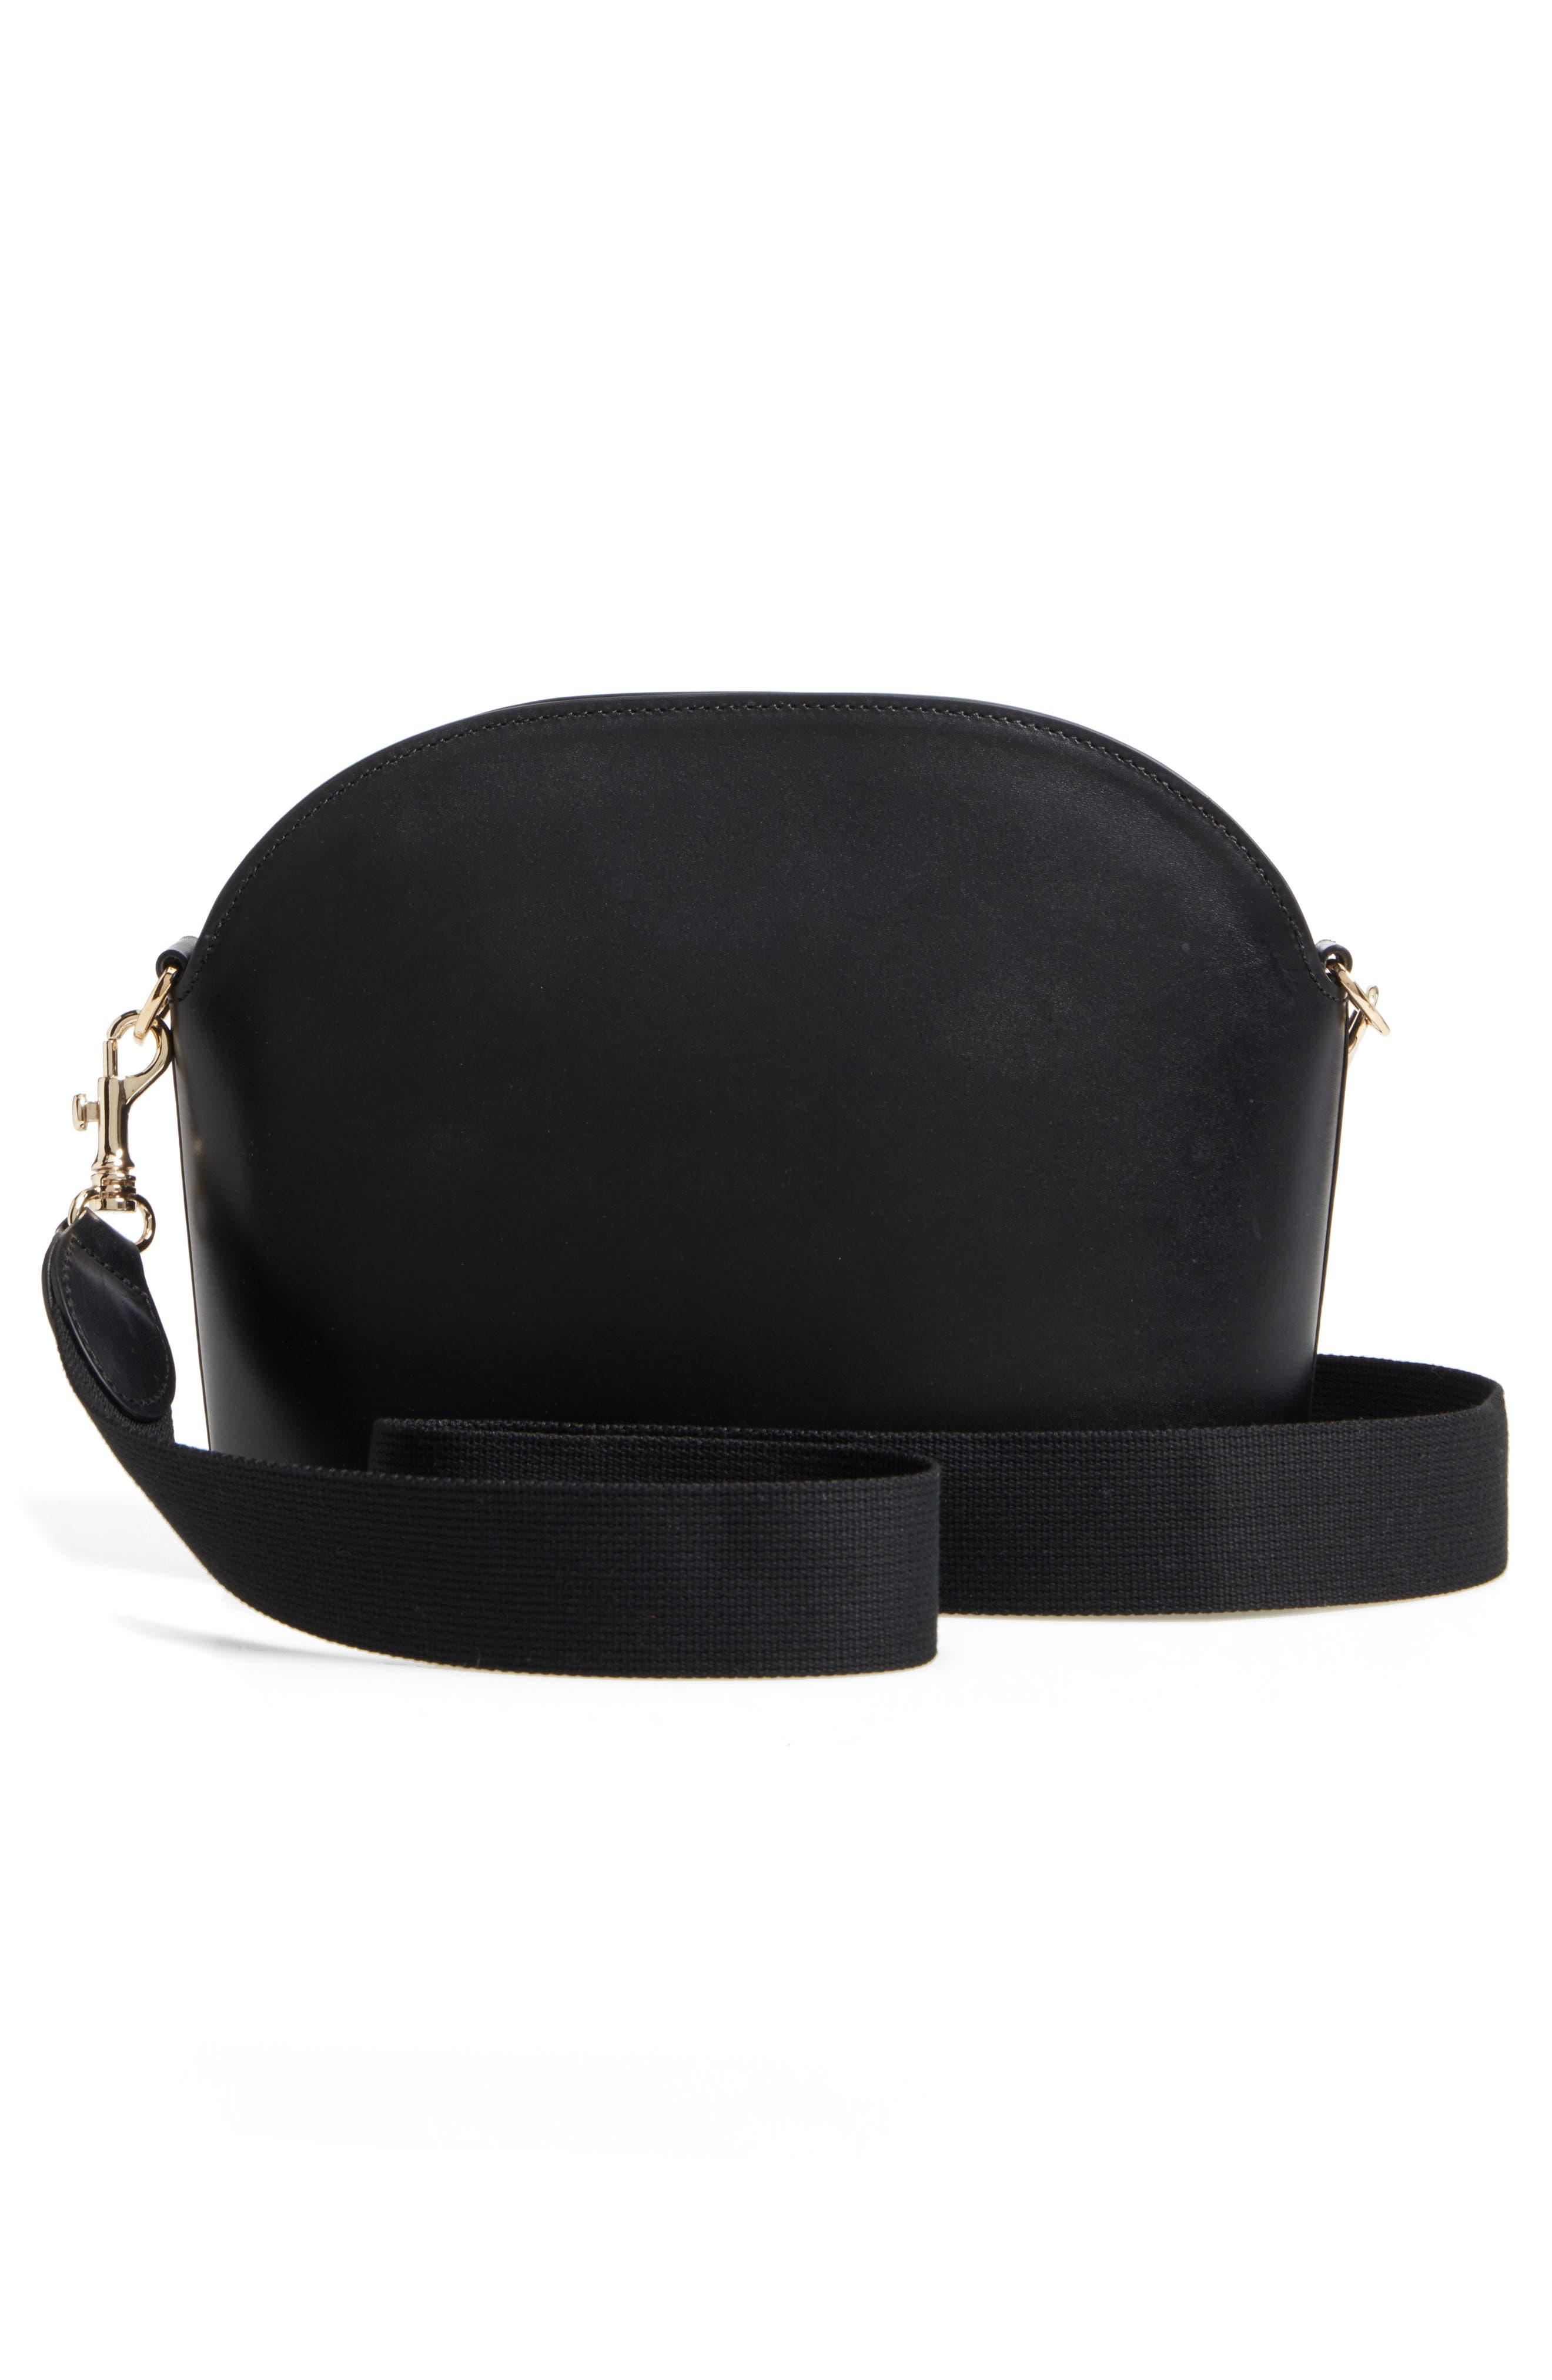 Gabrielle Leather Shoulder Bag,                             Alternate thumbnail 3, color,                             001